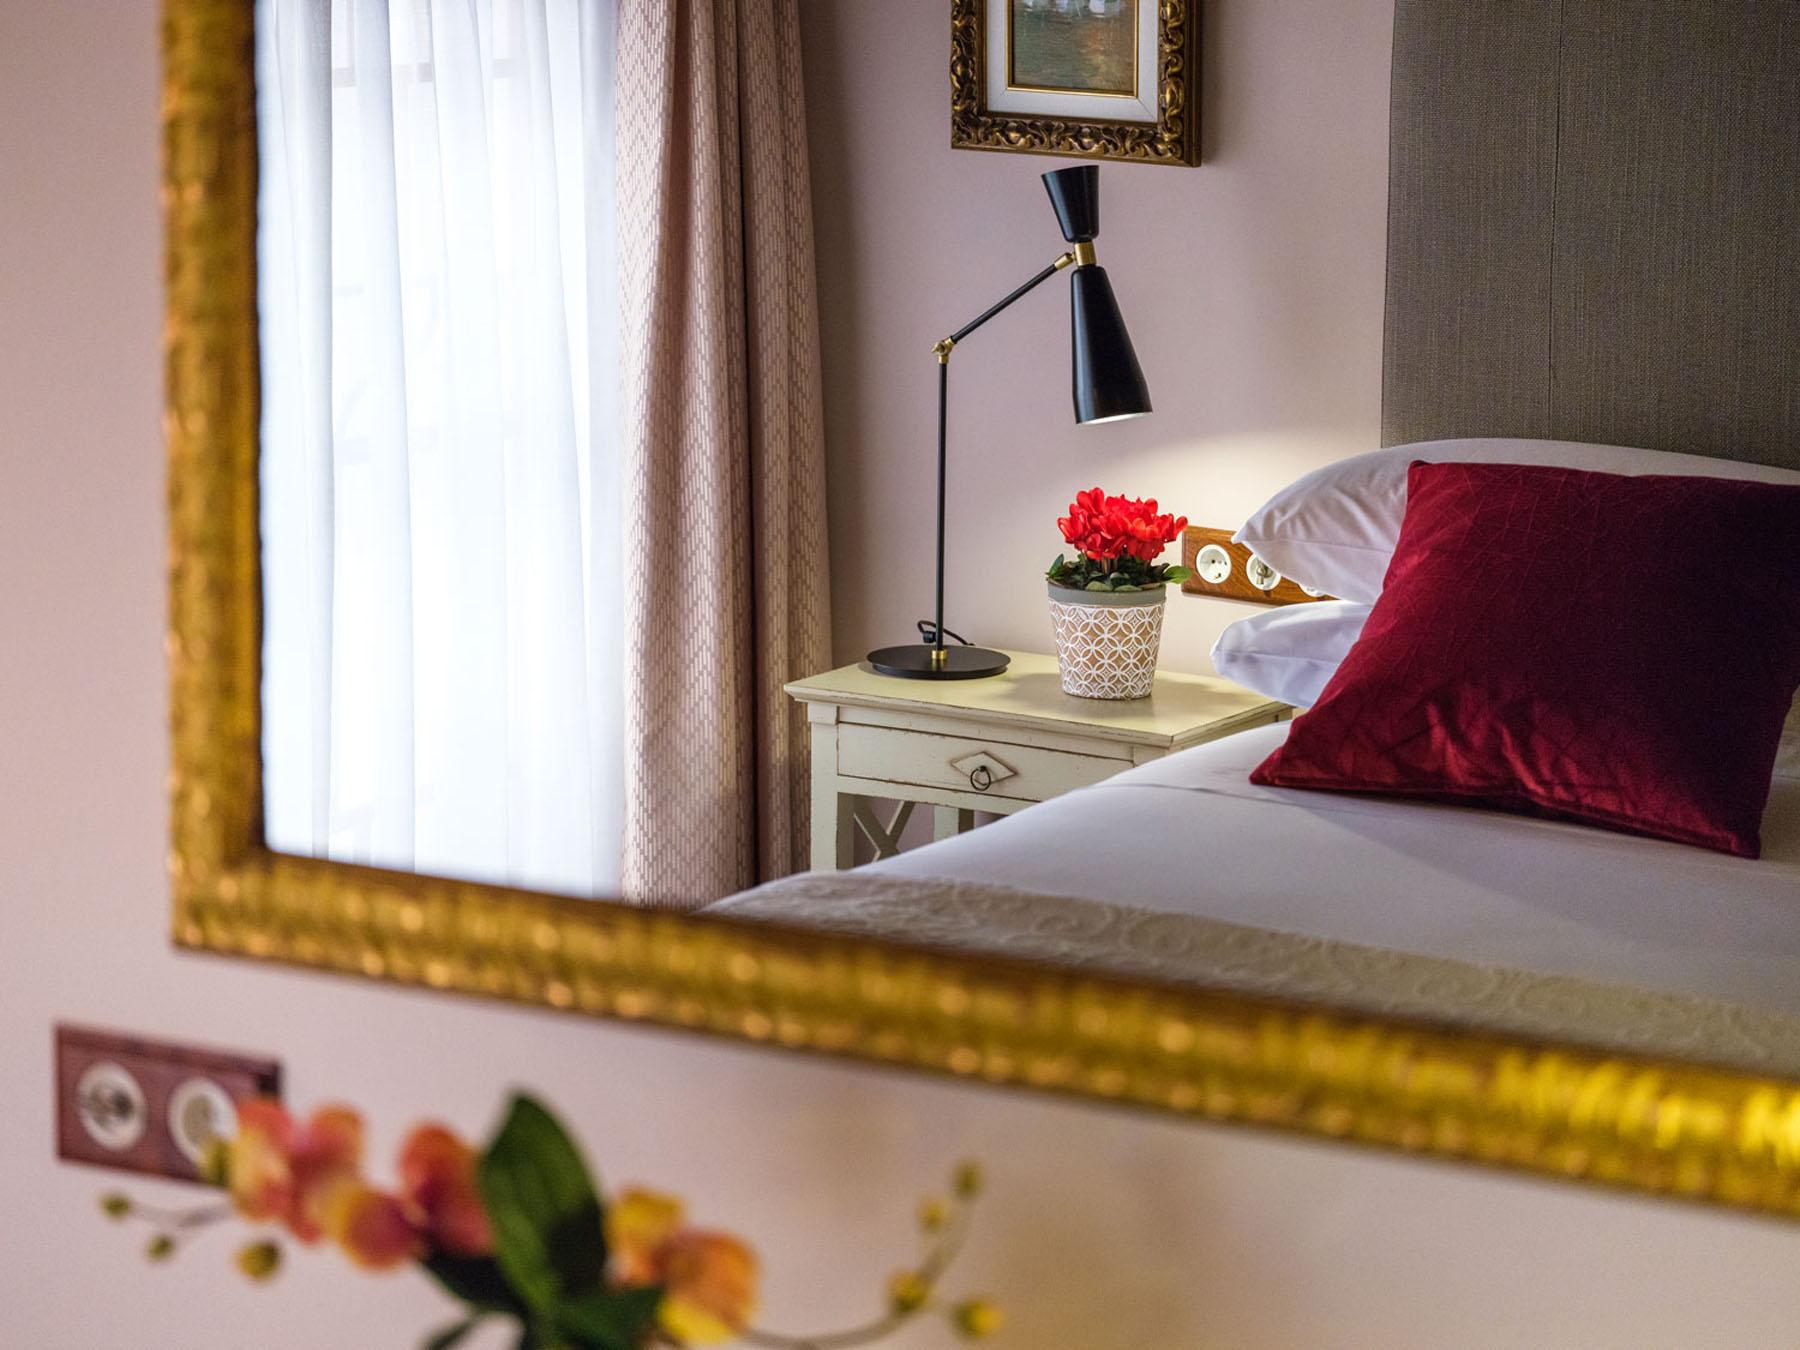 Decoración e interiorismo en hotel gloria de sant jaume